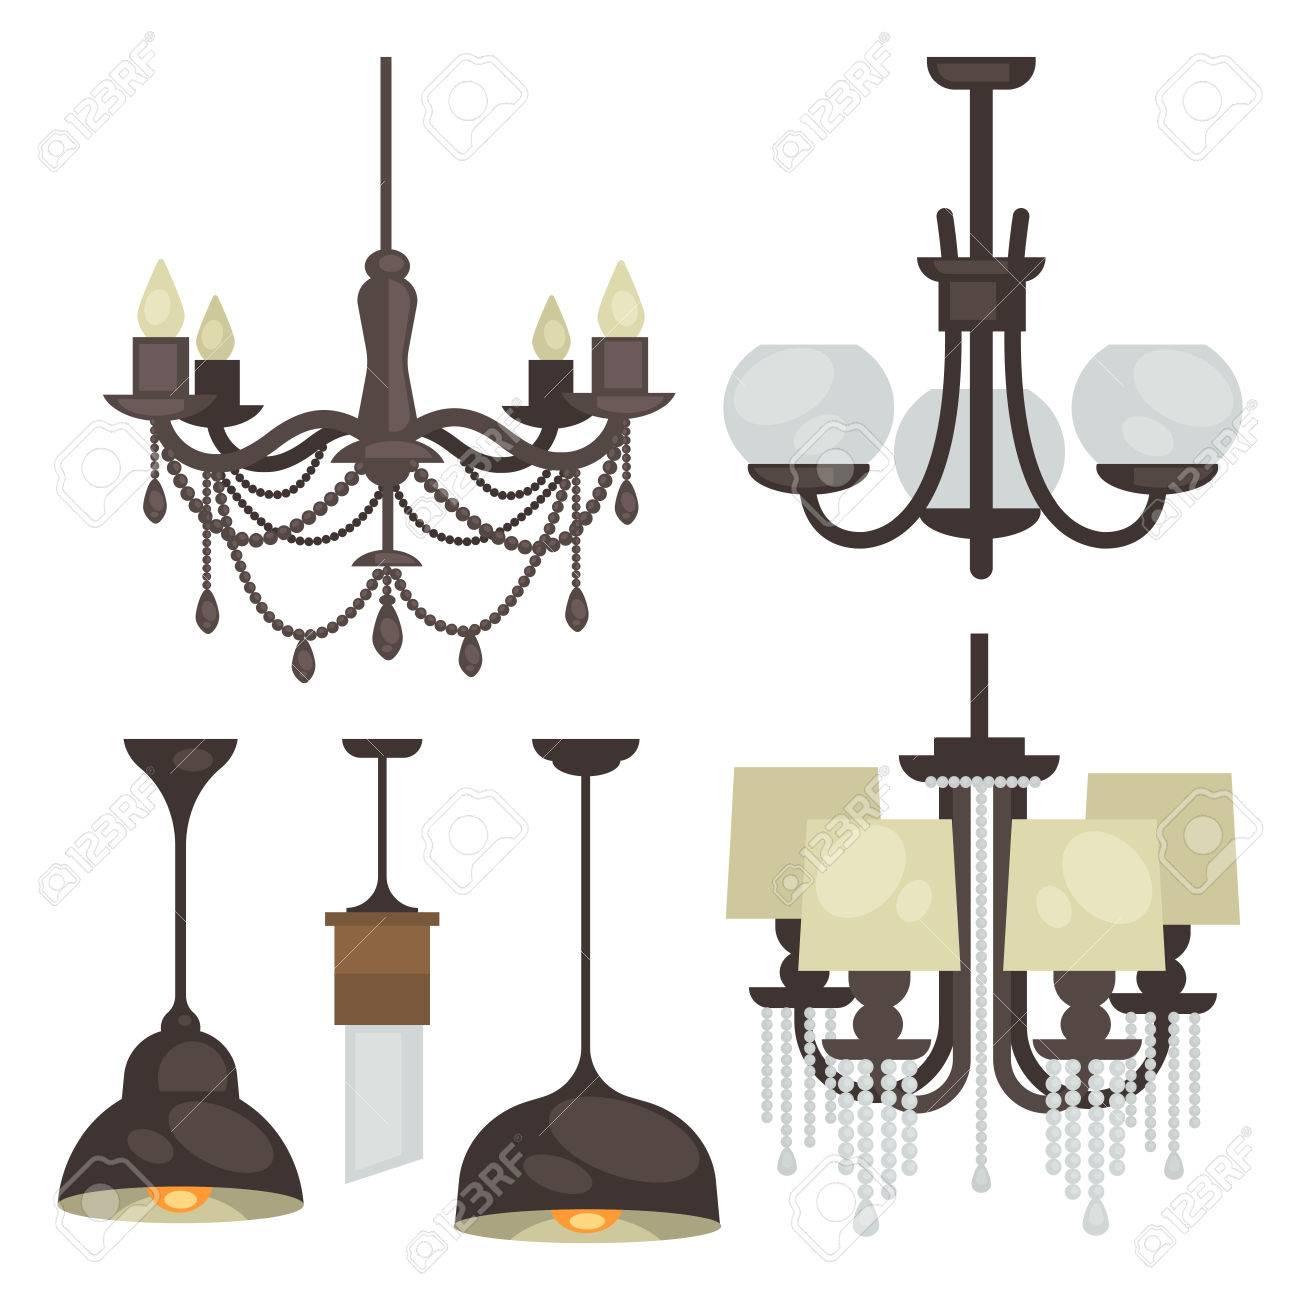 lamp set gesoleerd interieur licht design elektrische lampen kroonluchters lampen lichte interieur decoratie